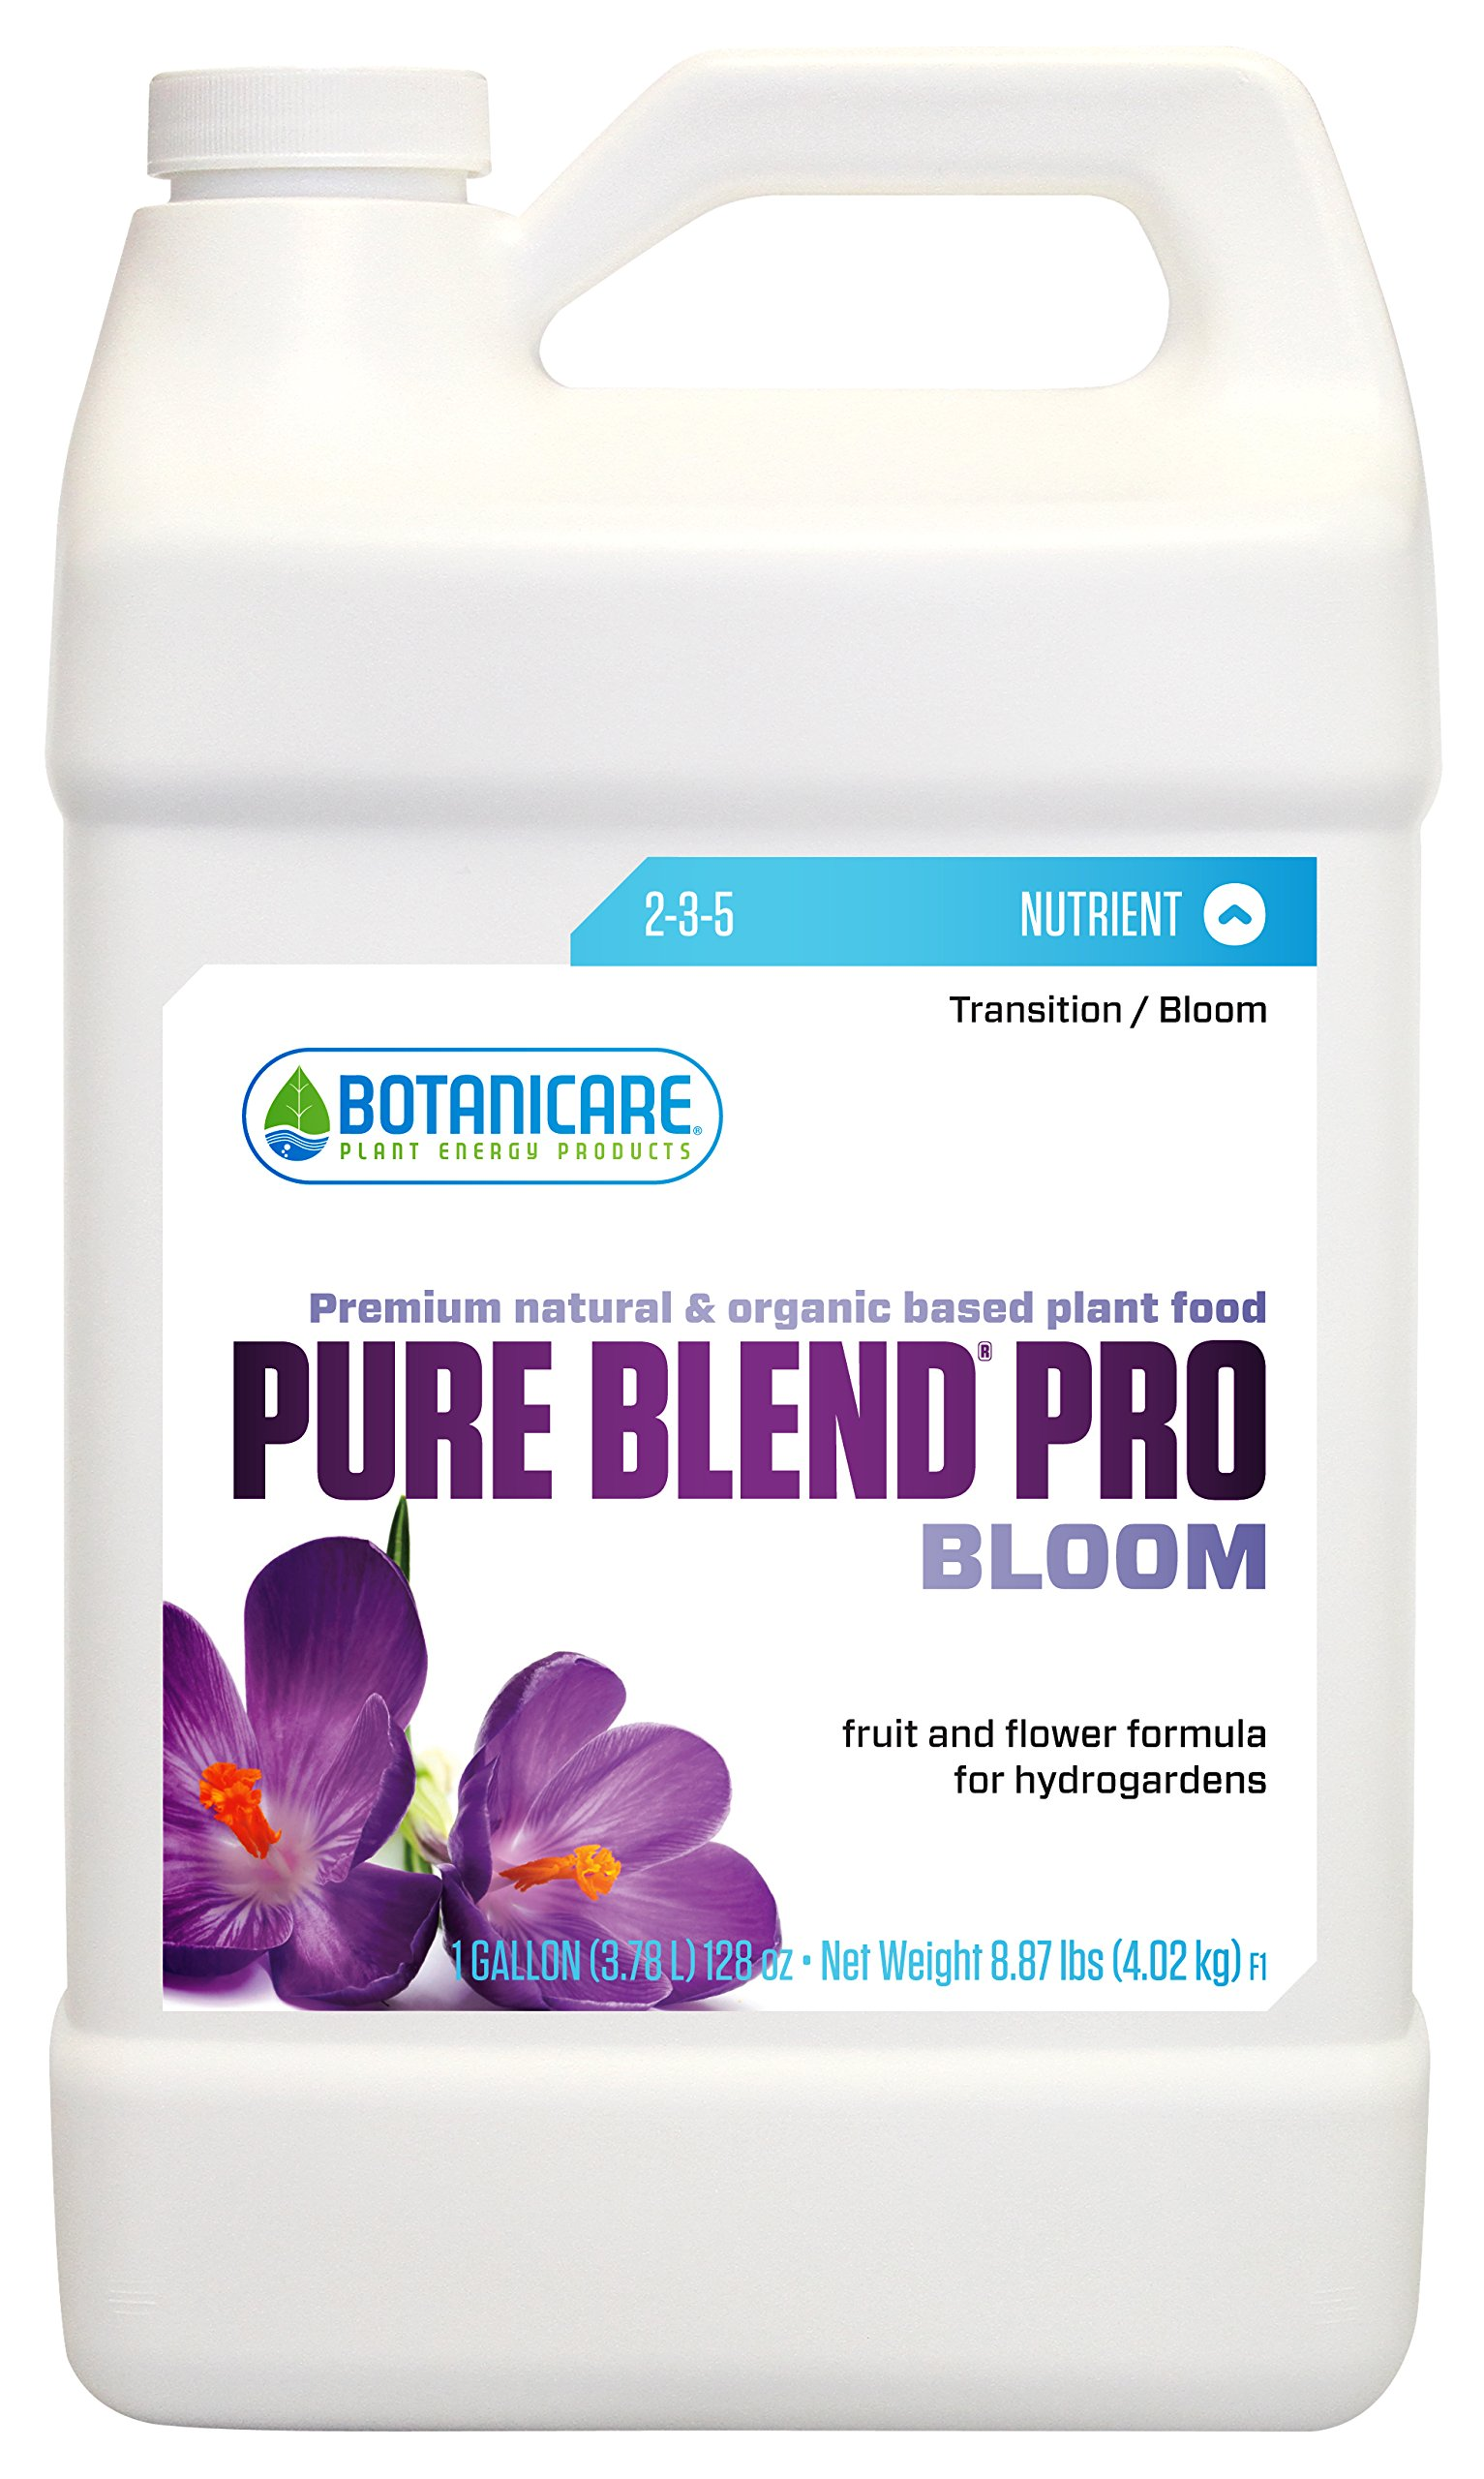 Botanicare PURE BLEND PRO Bloom Soil Nutrient 2-3-5 Formula, 1-Gallon (4-Pack) by Botanicare